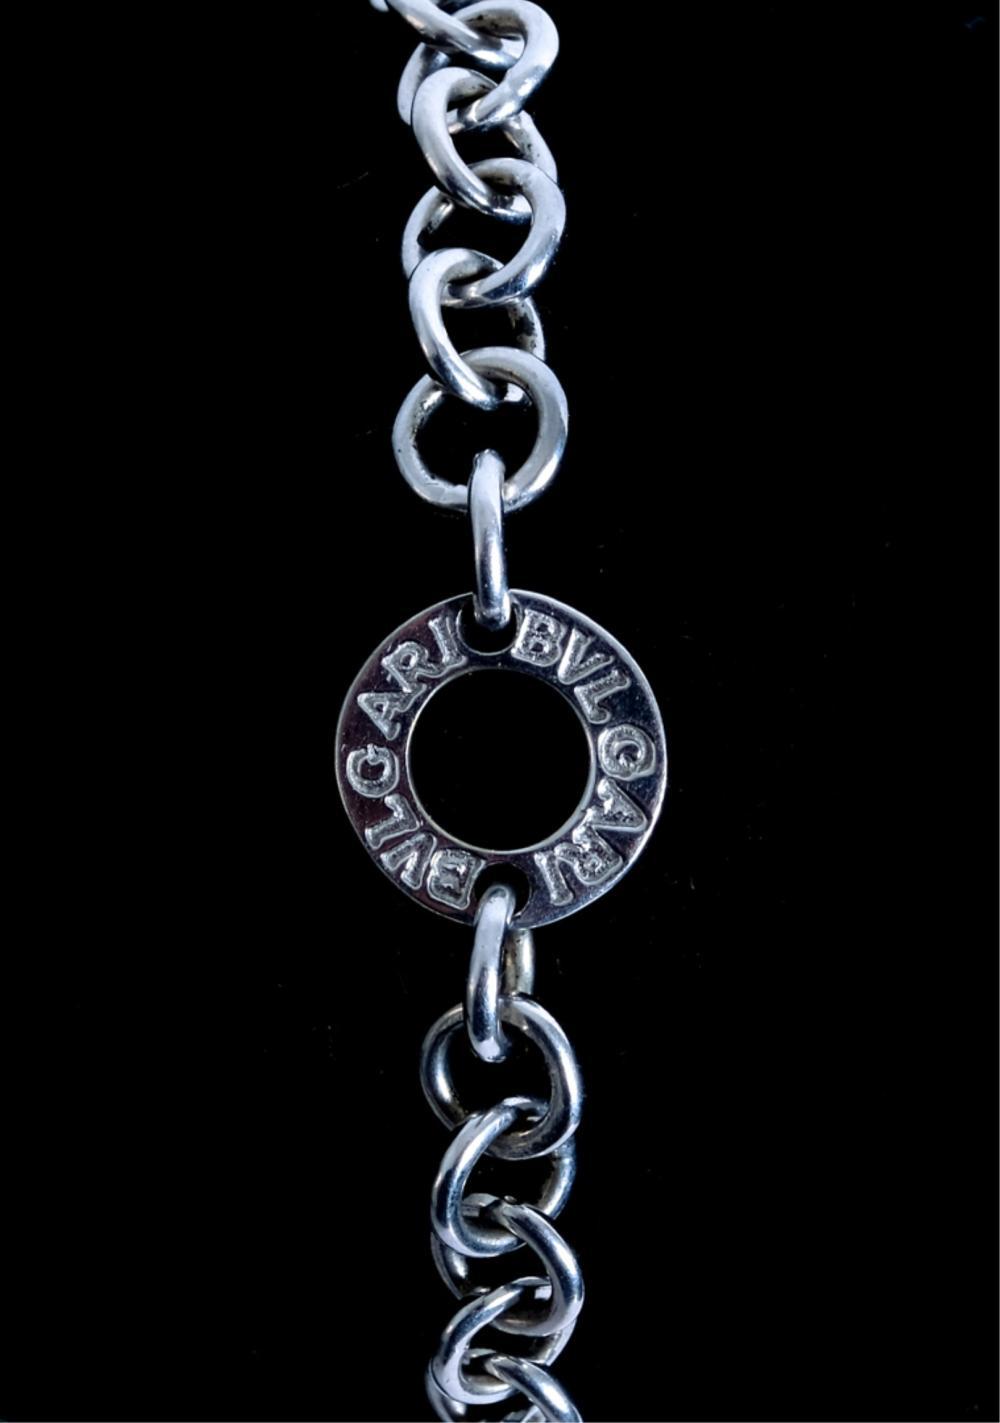 Bvlgari Bulgari 18k White Gold Signature Bracelet